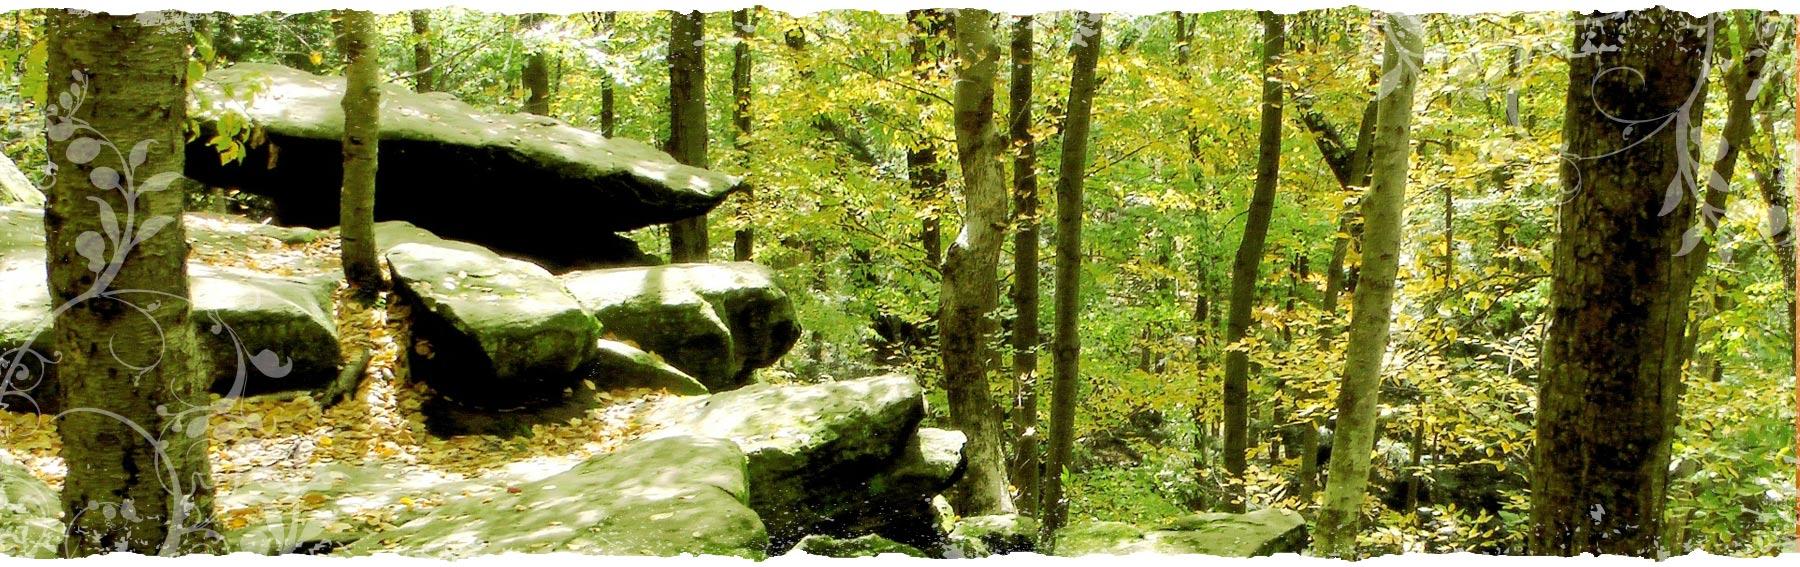 woods-rocks